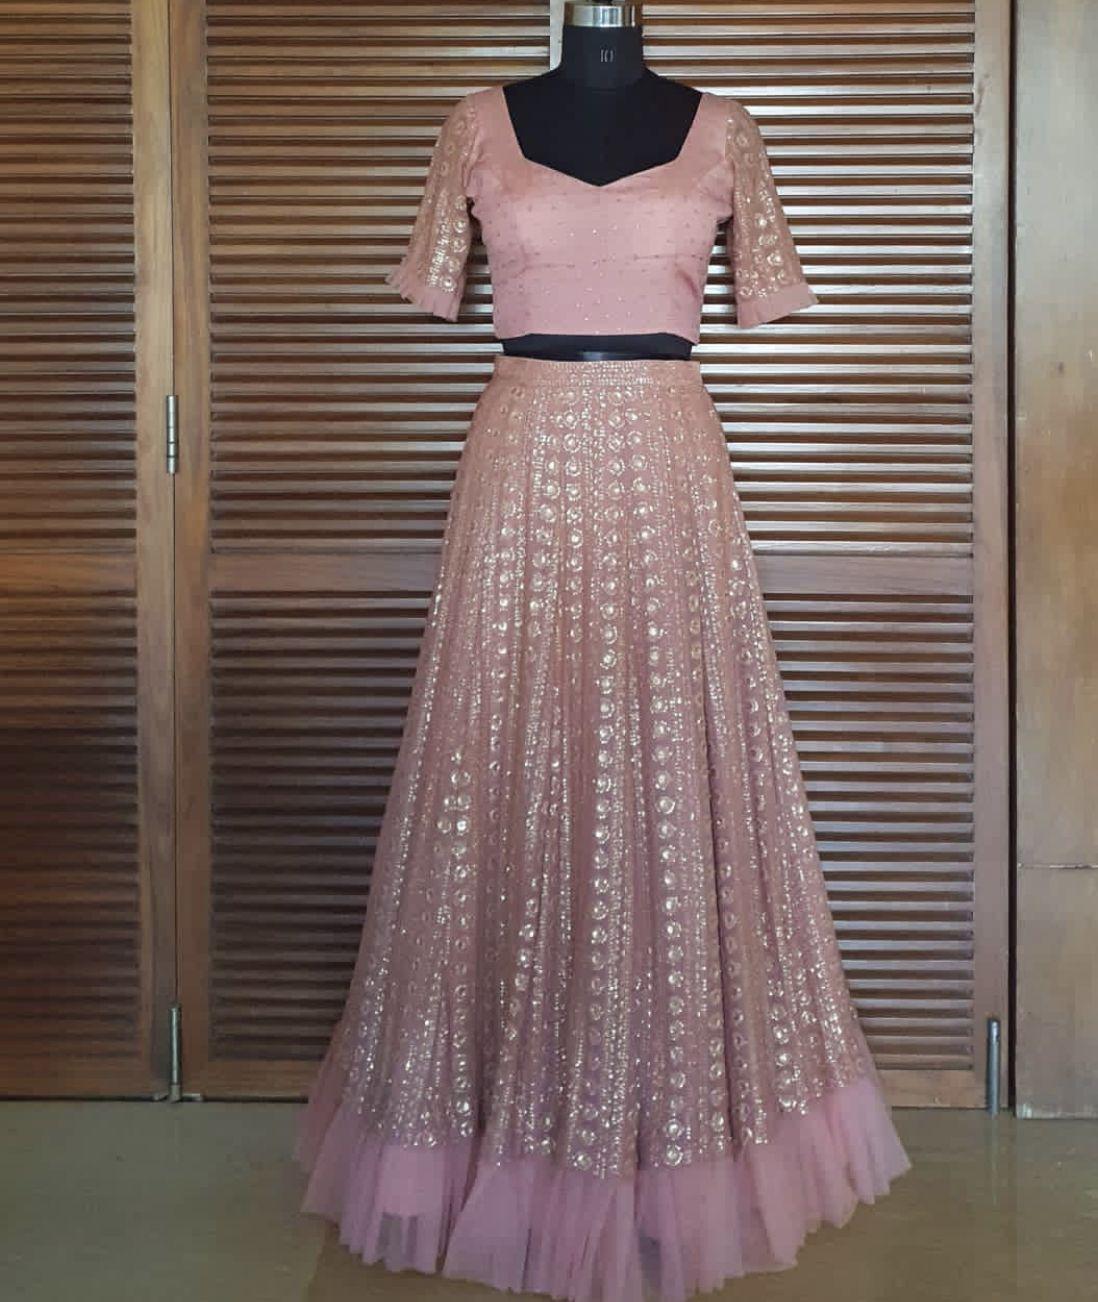 382fb4f7d4 Prom Dresses, Formal Dresses, Indian Dresses, Two Piece Skirt Set,  Bangles,. Visit. April 2019